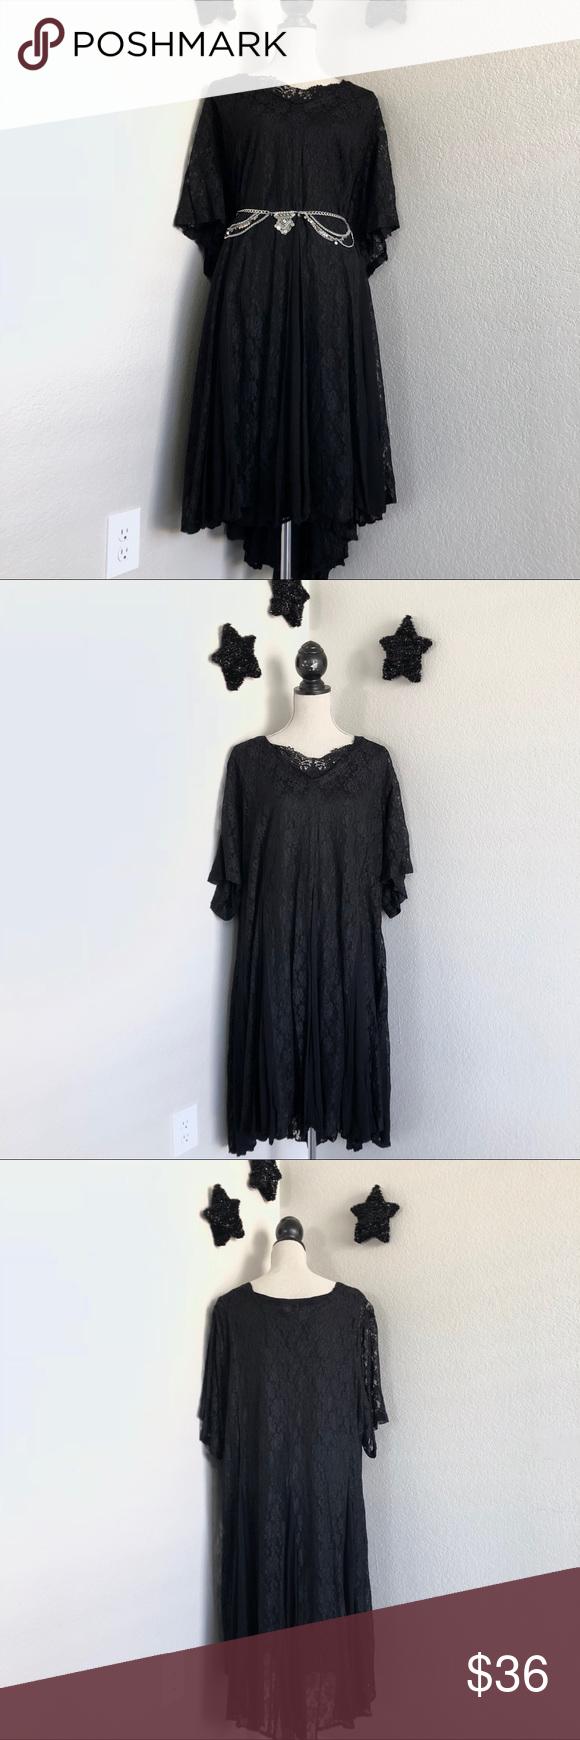 Vintage Black Lace Stevie Nicks Dress 16 Black Lace Dresses Dress 16 [ 1740 x 580 Pixel ]